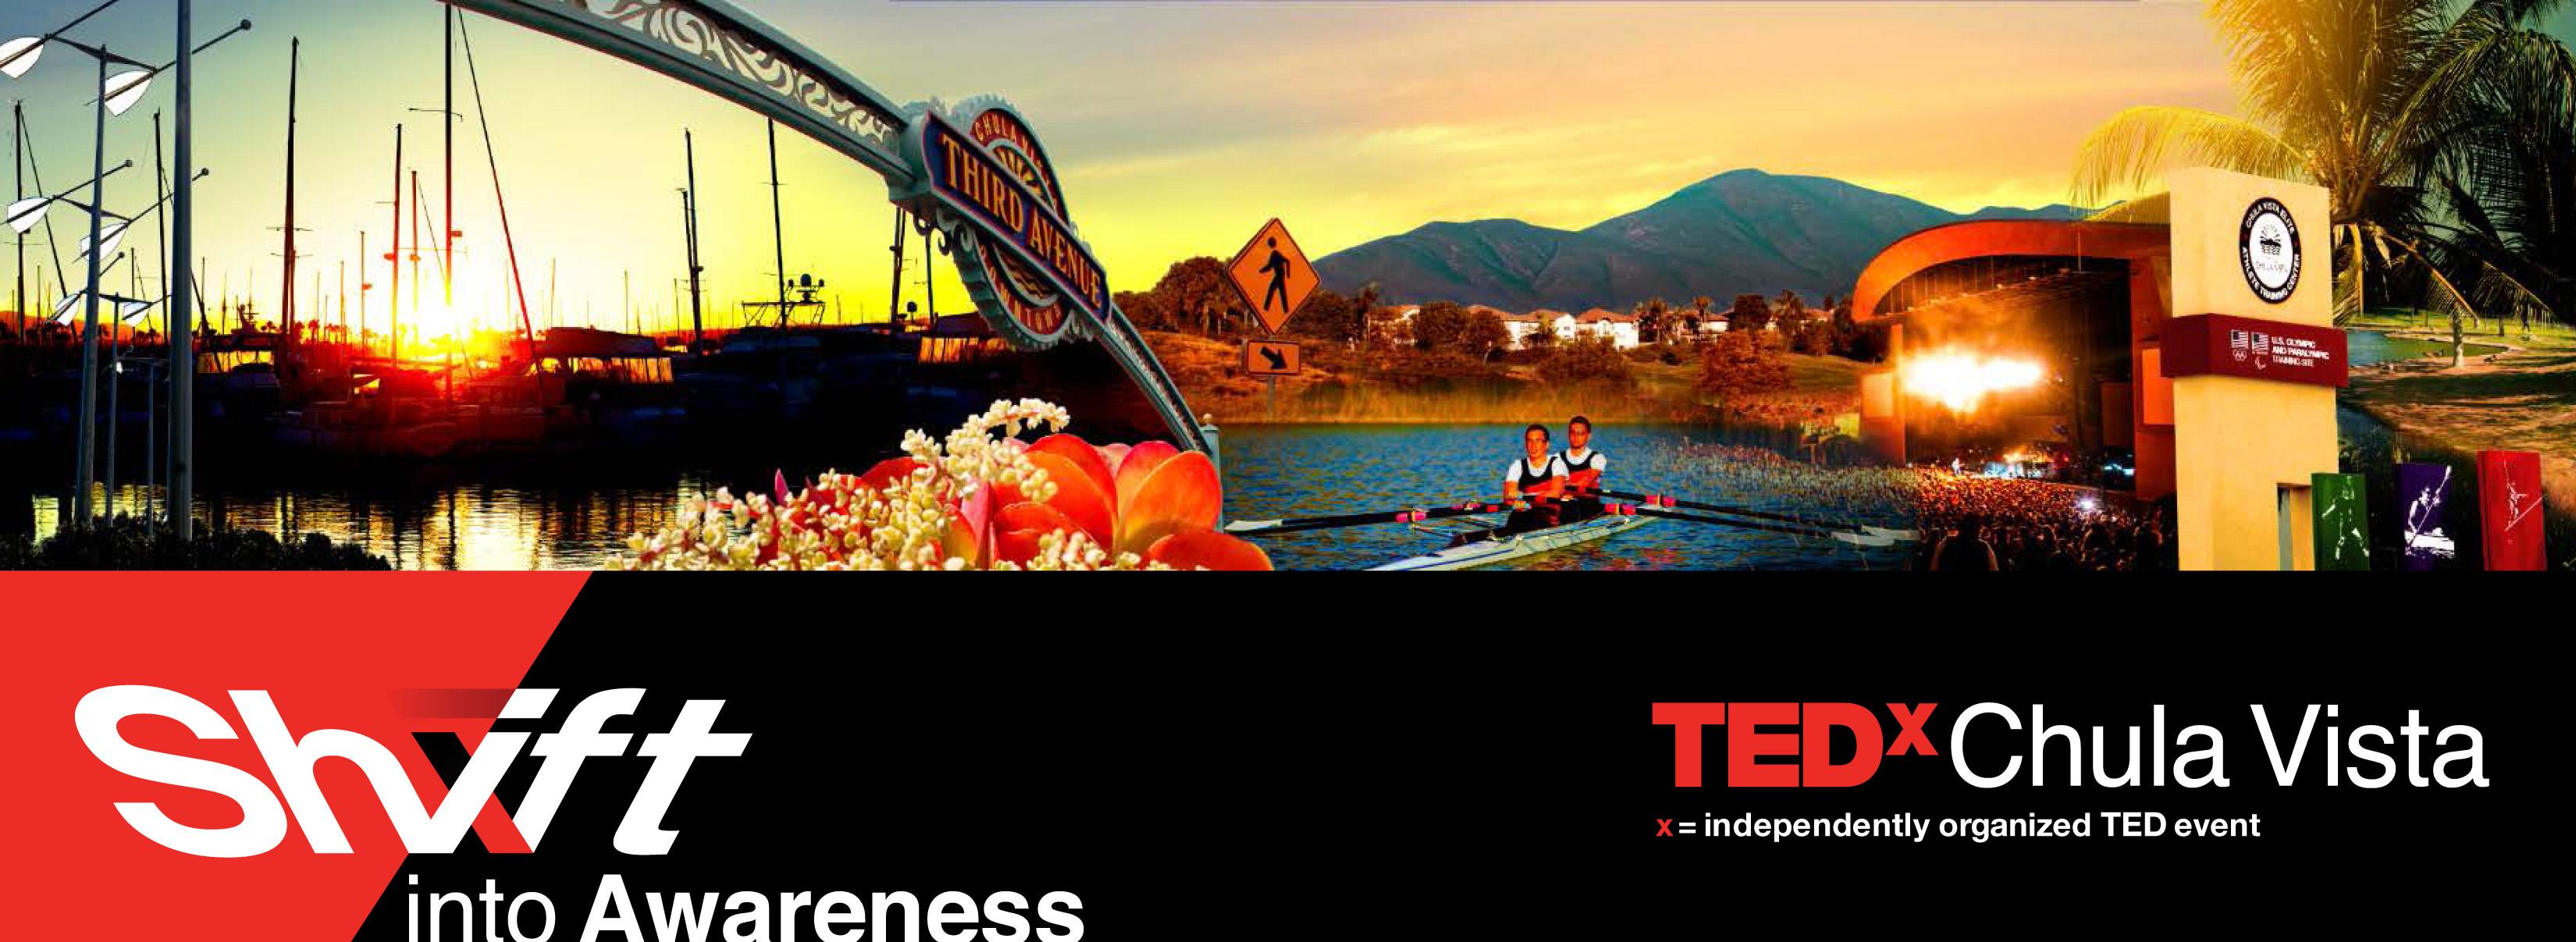 https://i0.wp.com/tedxchulavista.com/wp-content/uploads/2018/01/TEDxLogoFINALheader.jpg?ssl=1